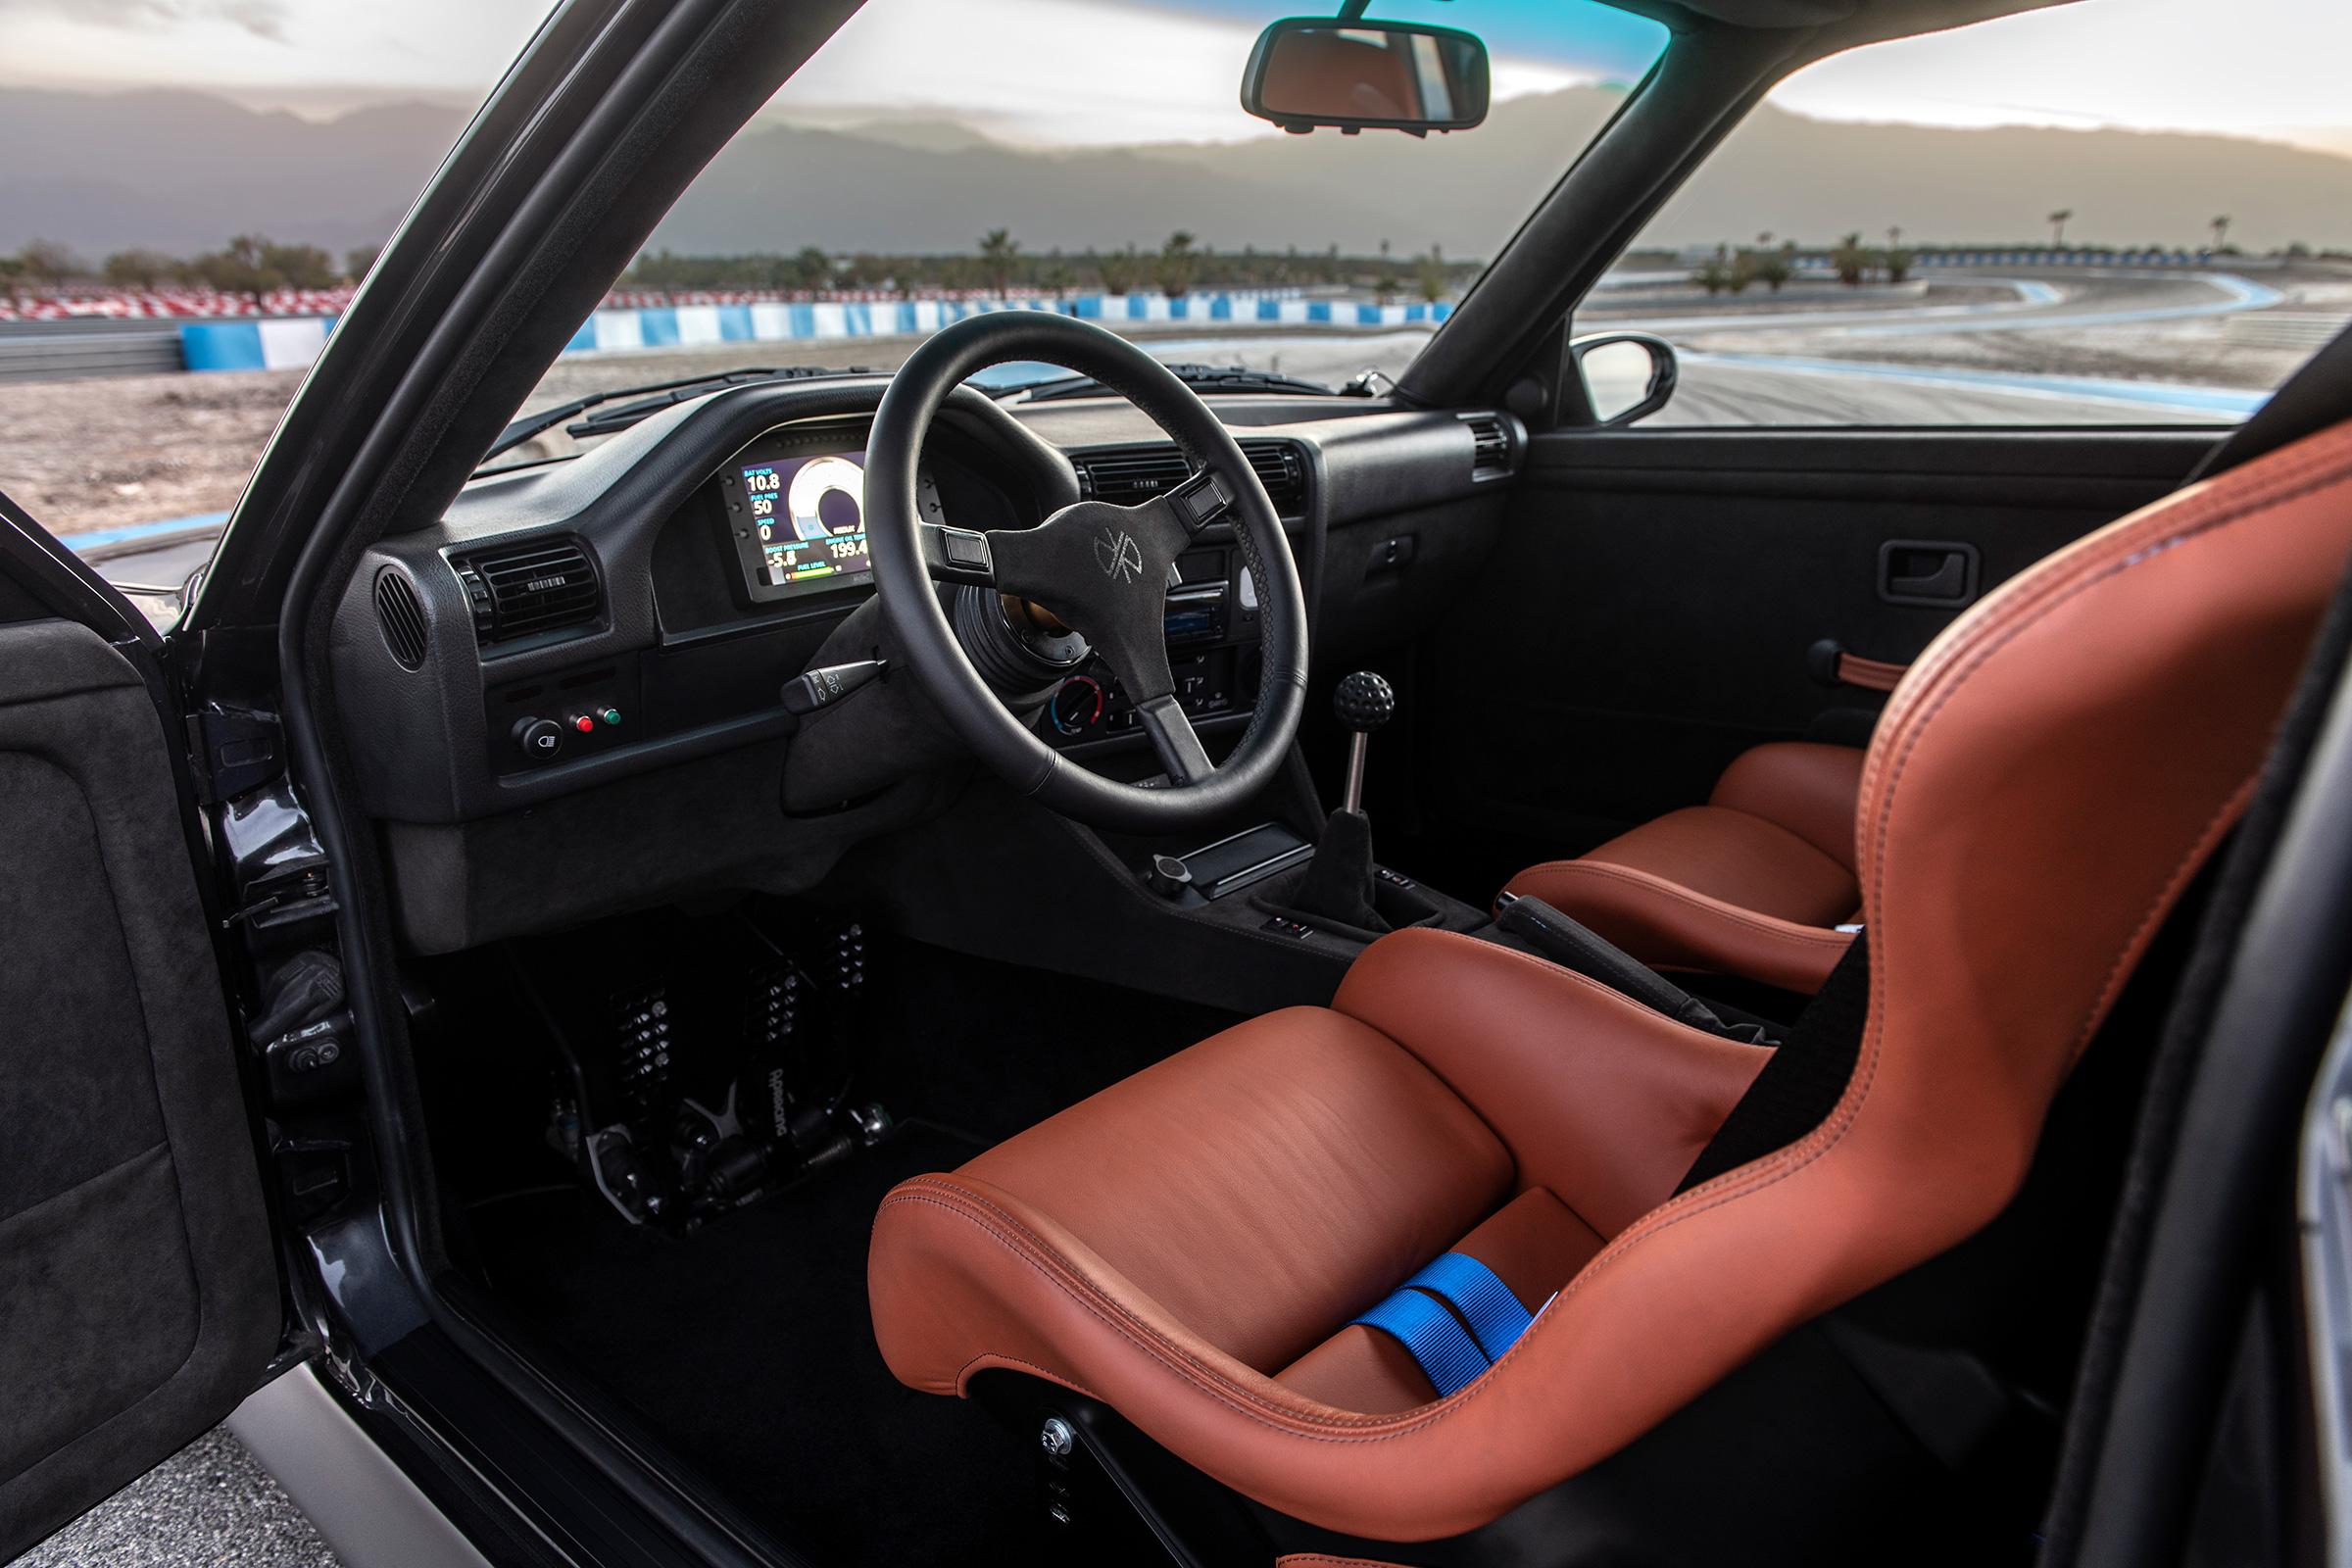 E30 Bmw M3 Enhanced By Restorer Redux Evo